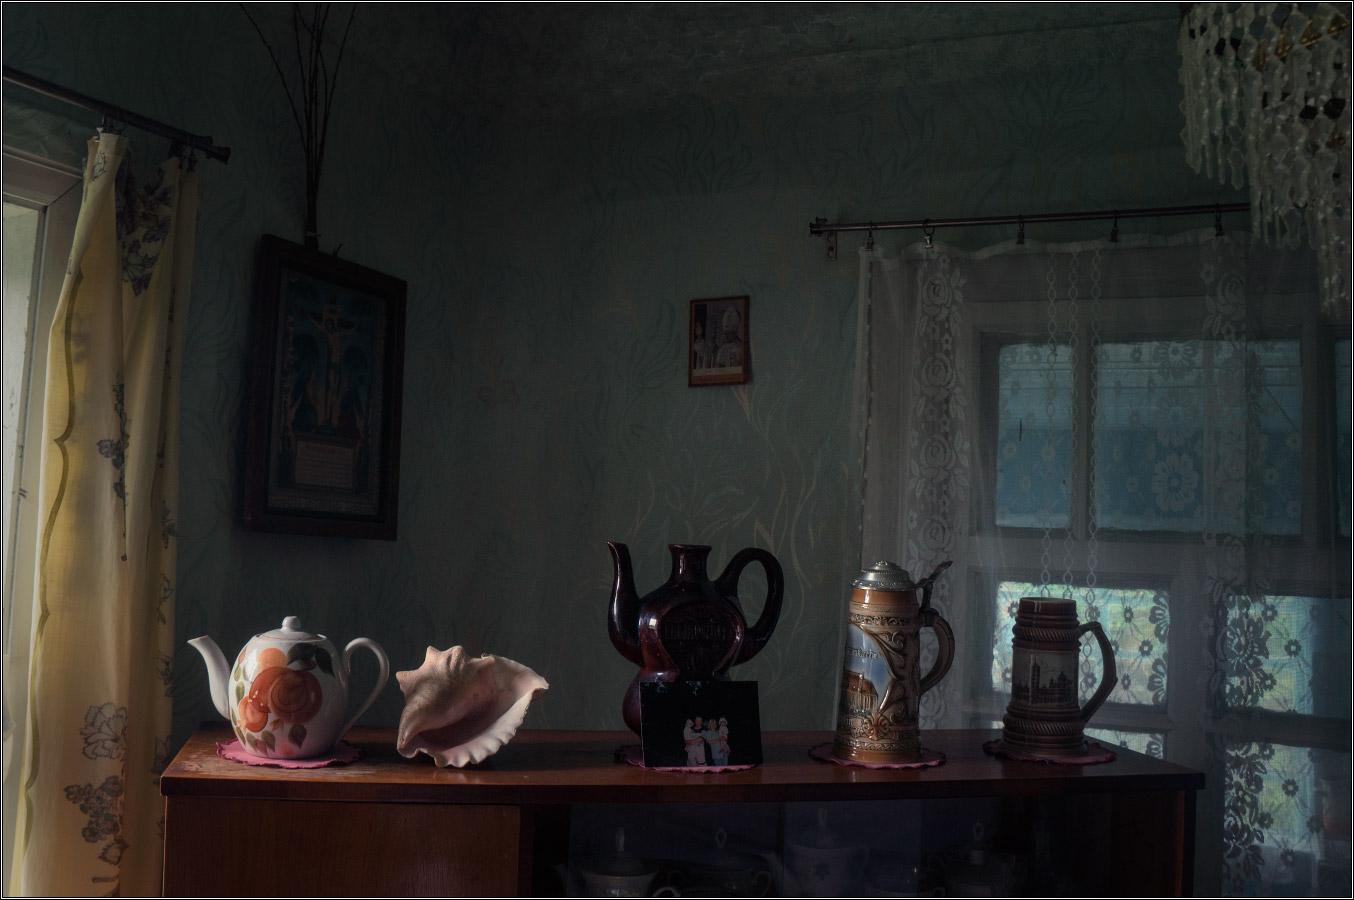 http://img-fotki.yandex.ru/get/6700/20899749.3/0_10f3ce_742121f4_orig.jpg